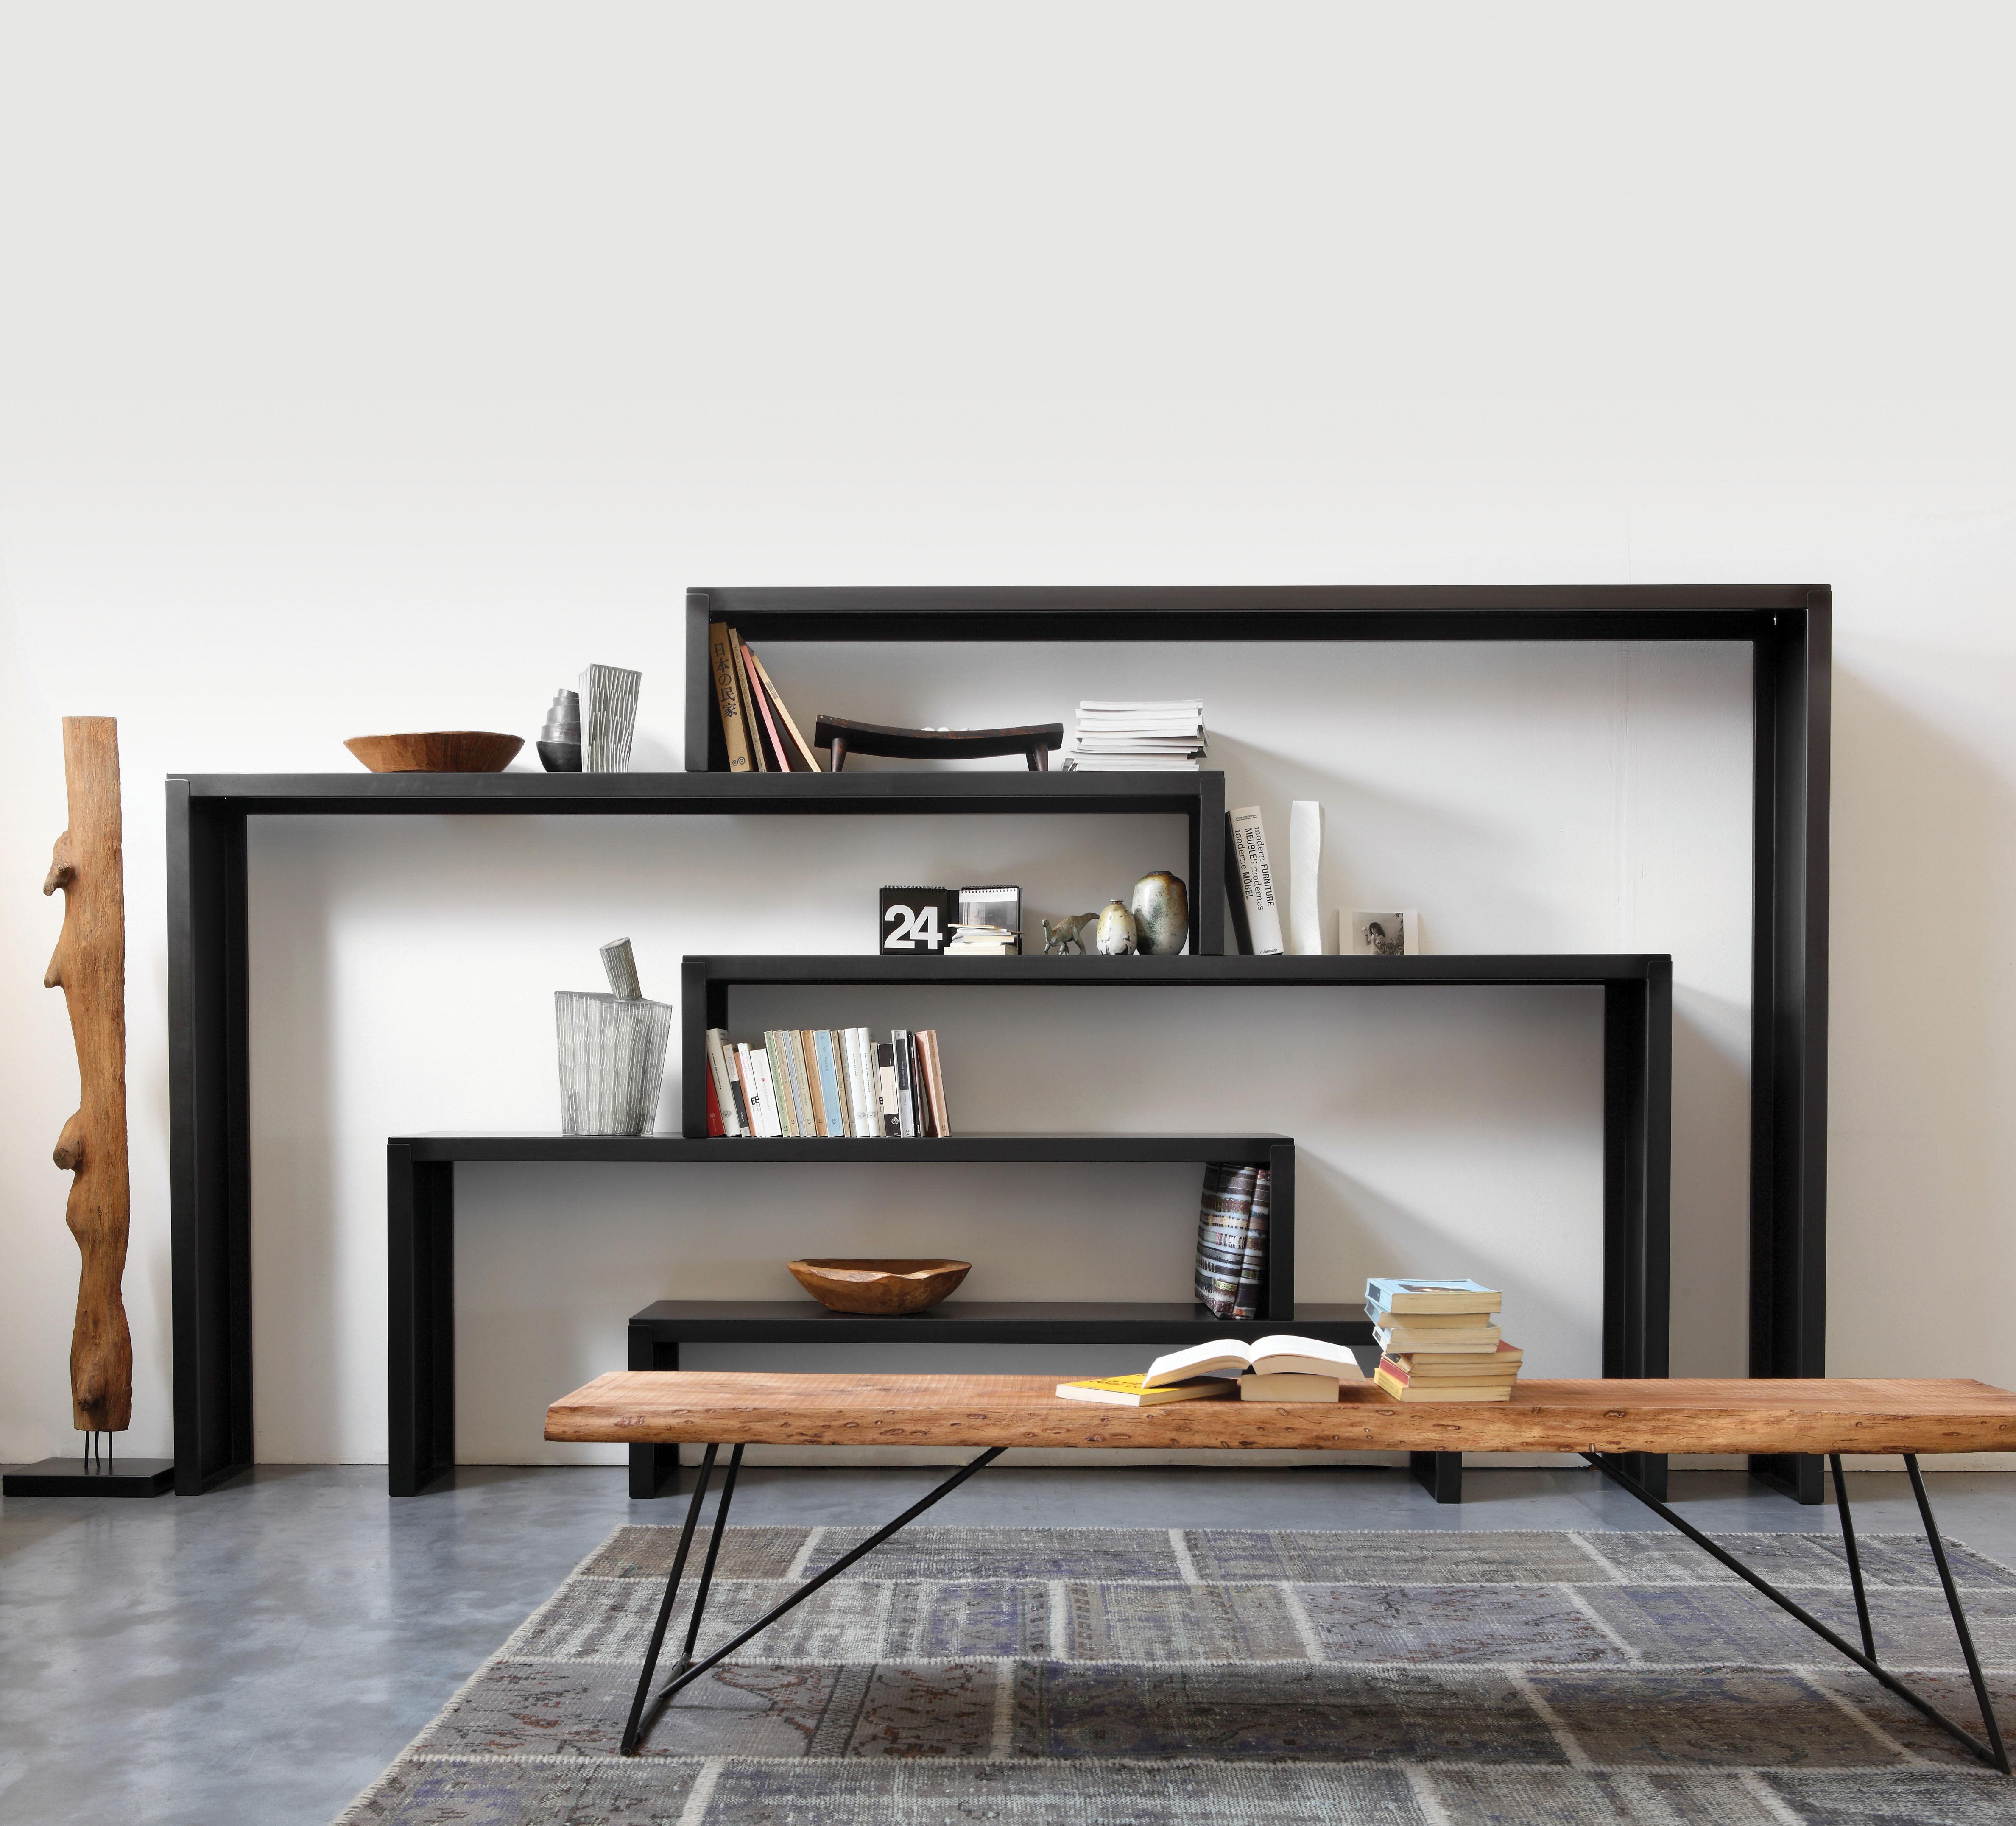 modernes mobel design, old times bench natural wood / black leg by zeus, Design ideen